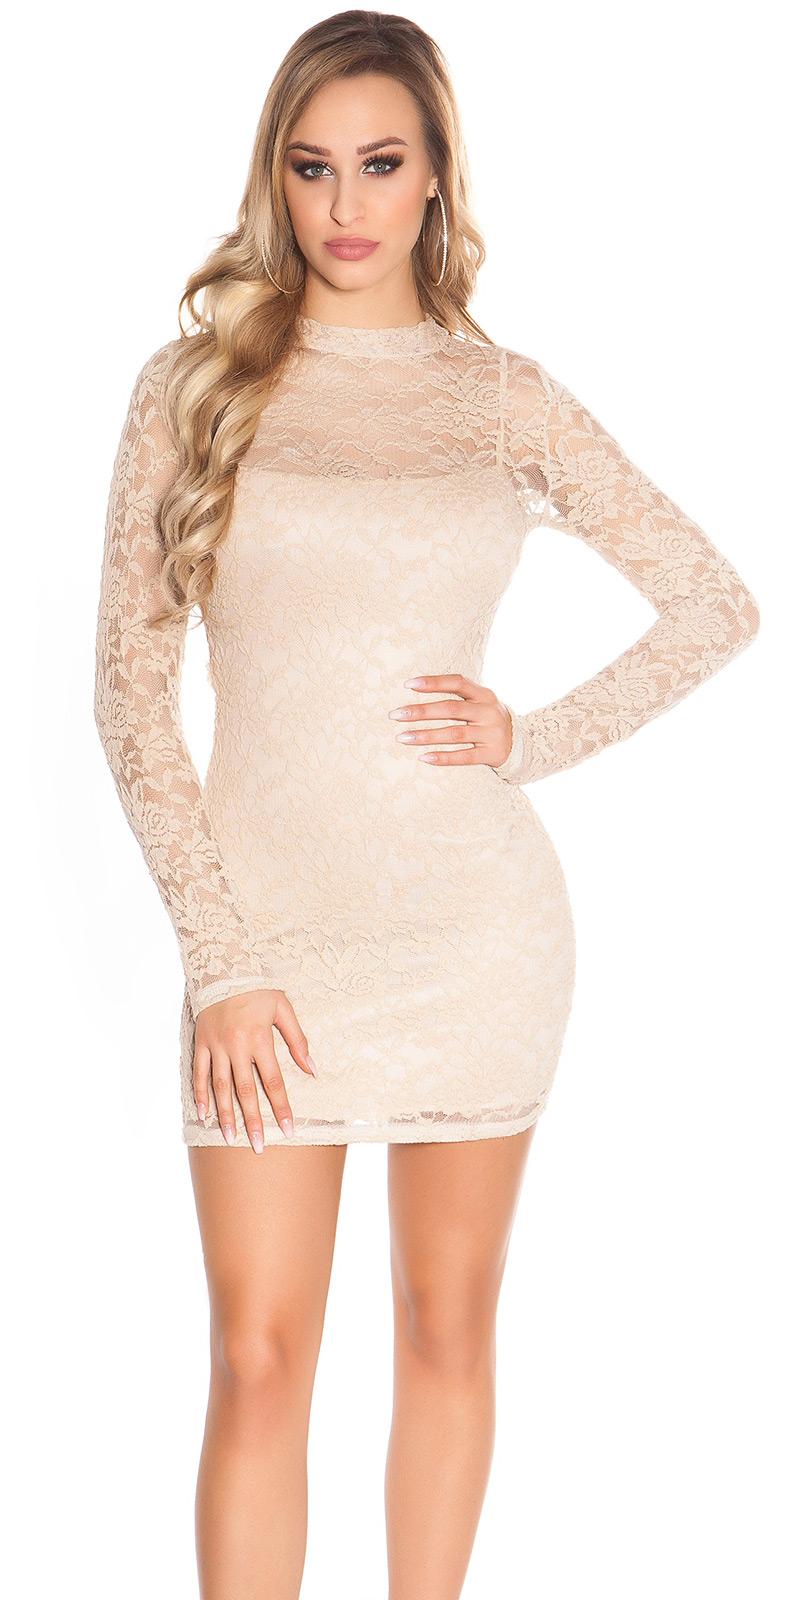 Šaty s dlouhým rukávem 0000IN50161 - Beige